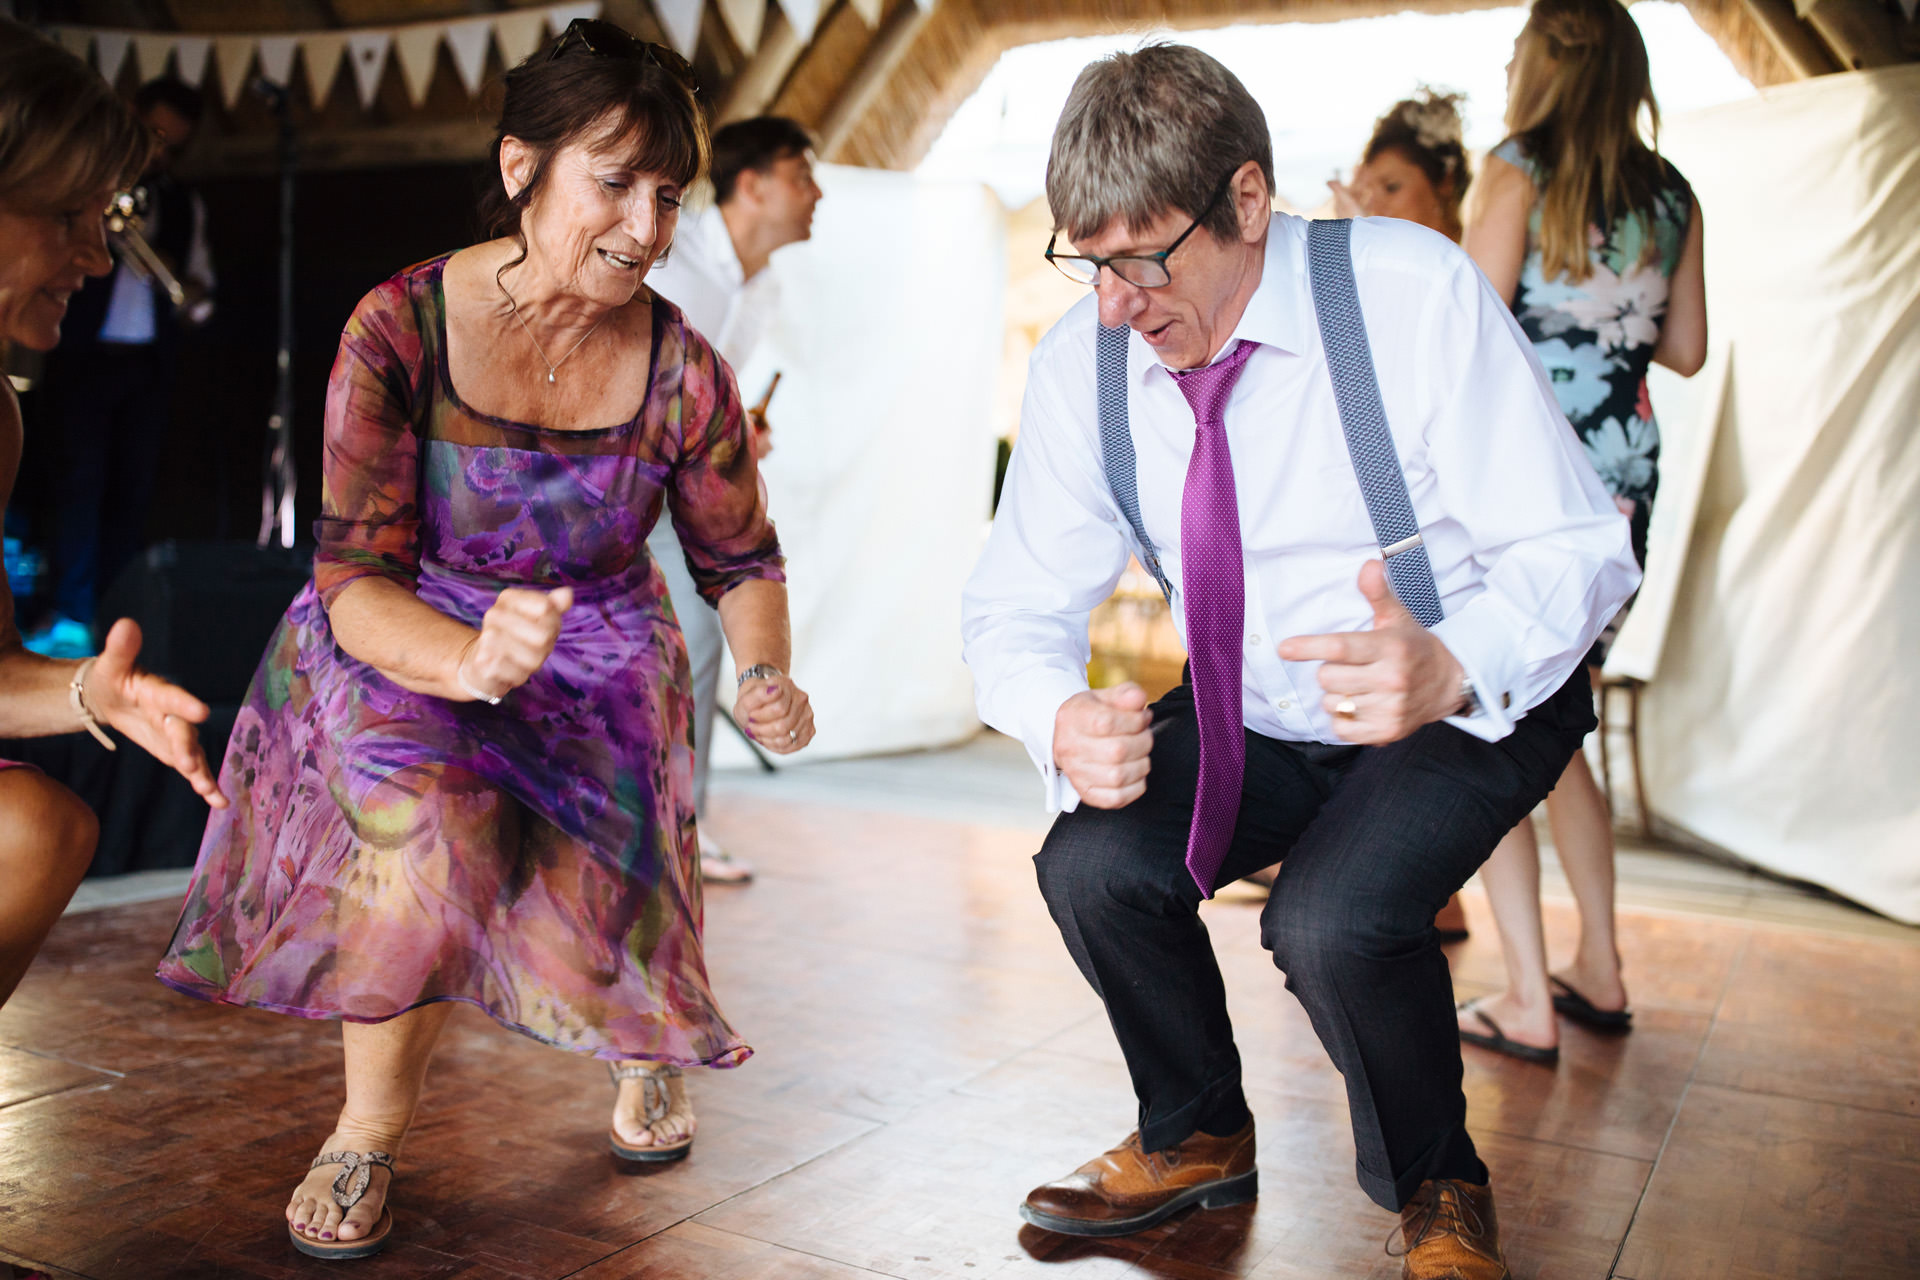 brides mum in purple floral dress and man in purple tie getting low on the dancefloor